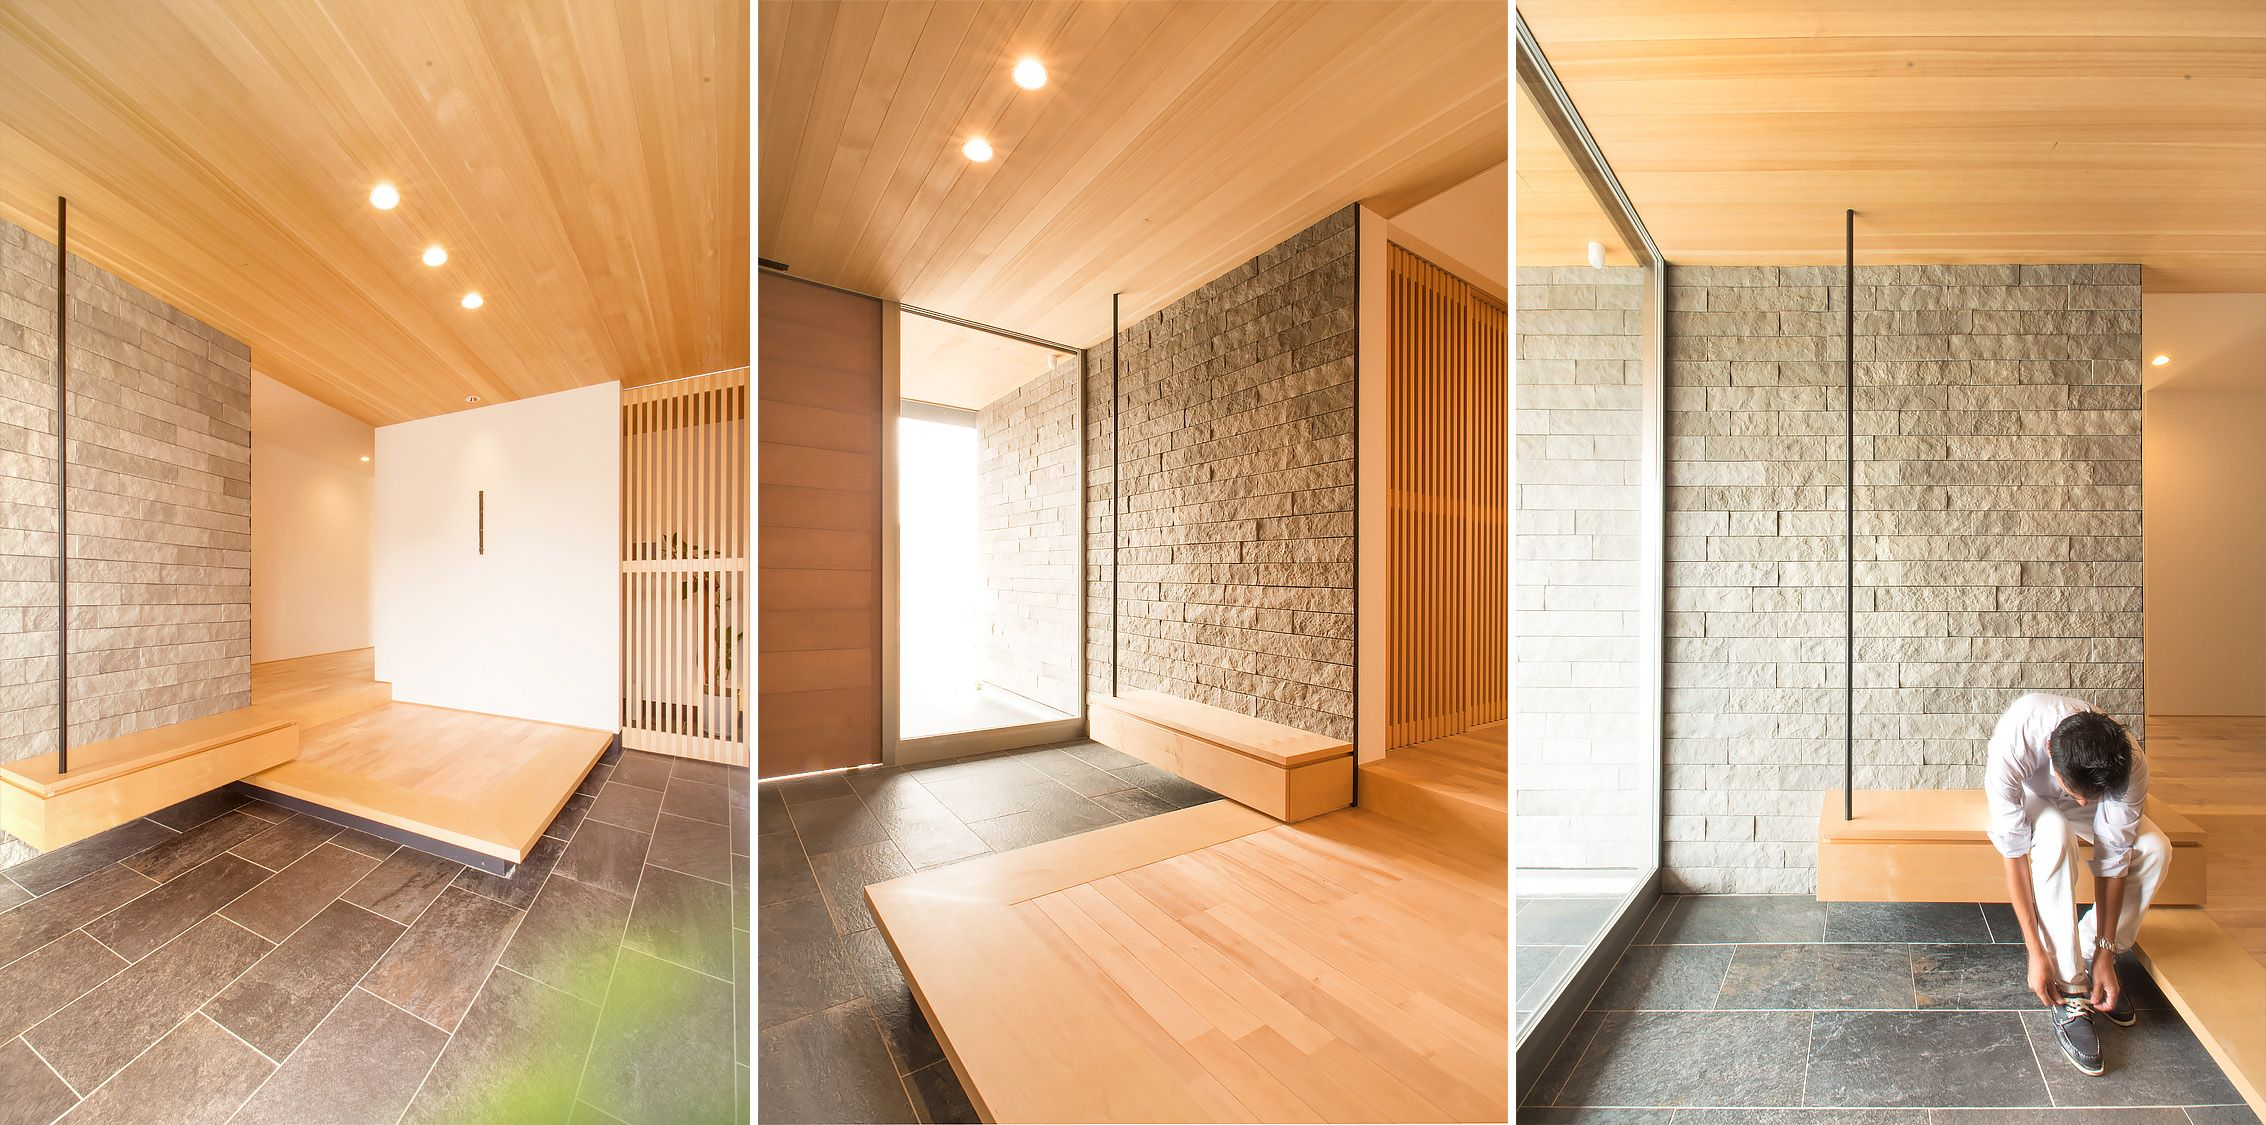 Nakasone genkan modern archi interior - Modern japanese home decor ...